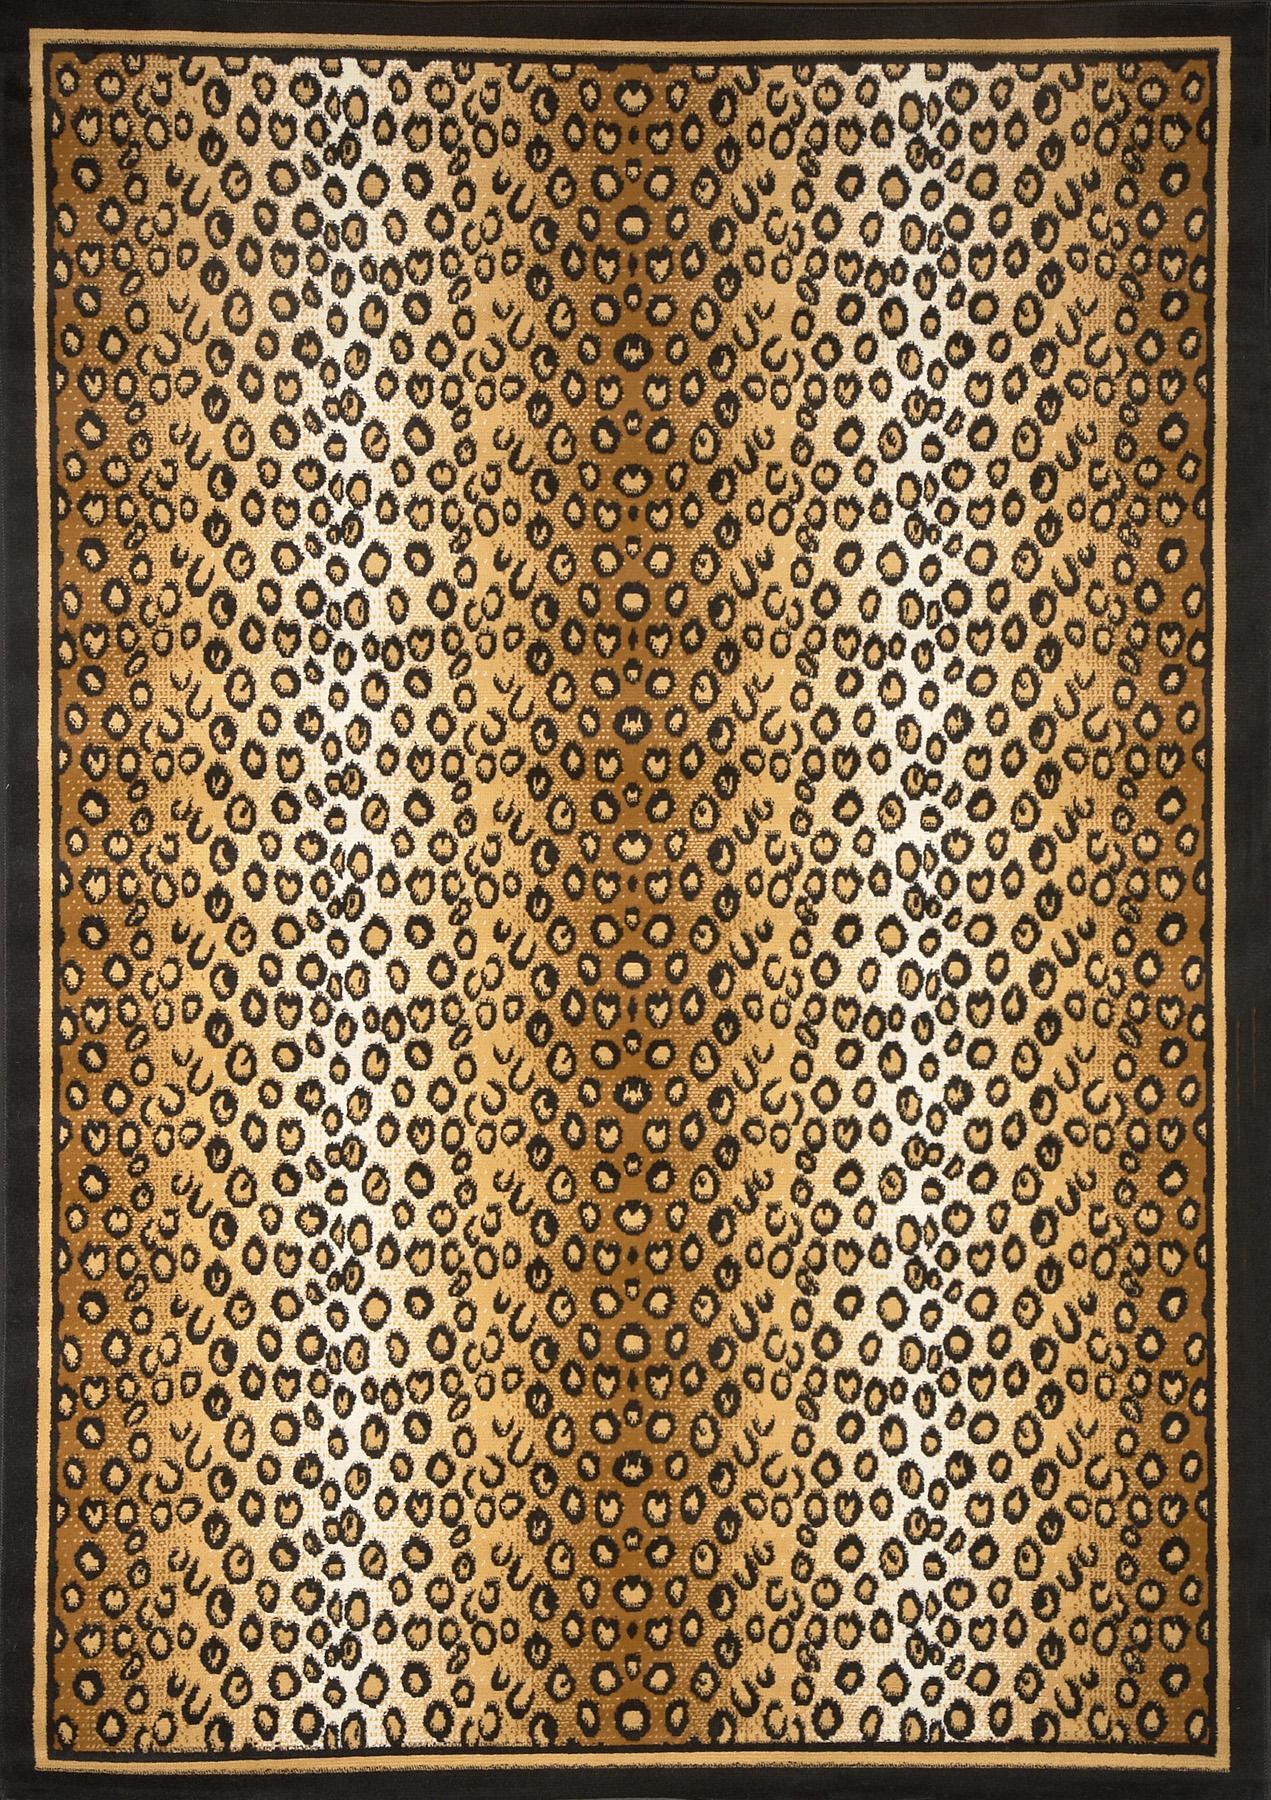 Modern Leopard Animal Print Area Rug 8x11 Zebra